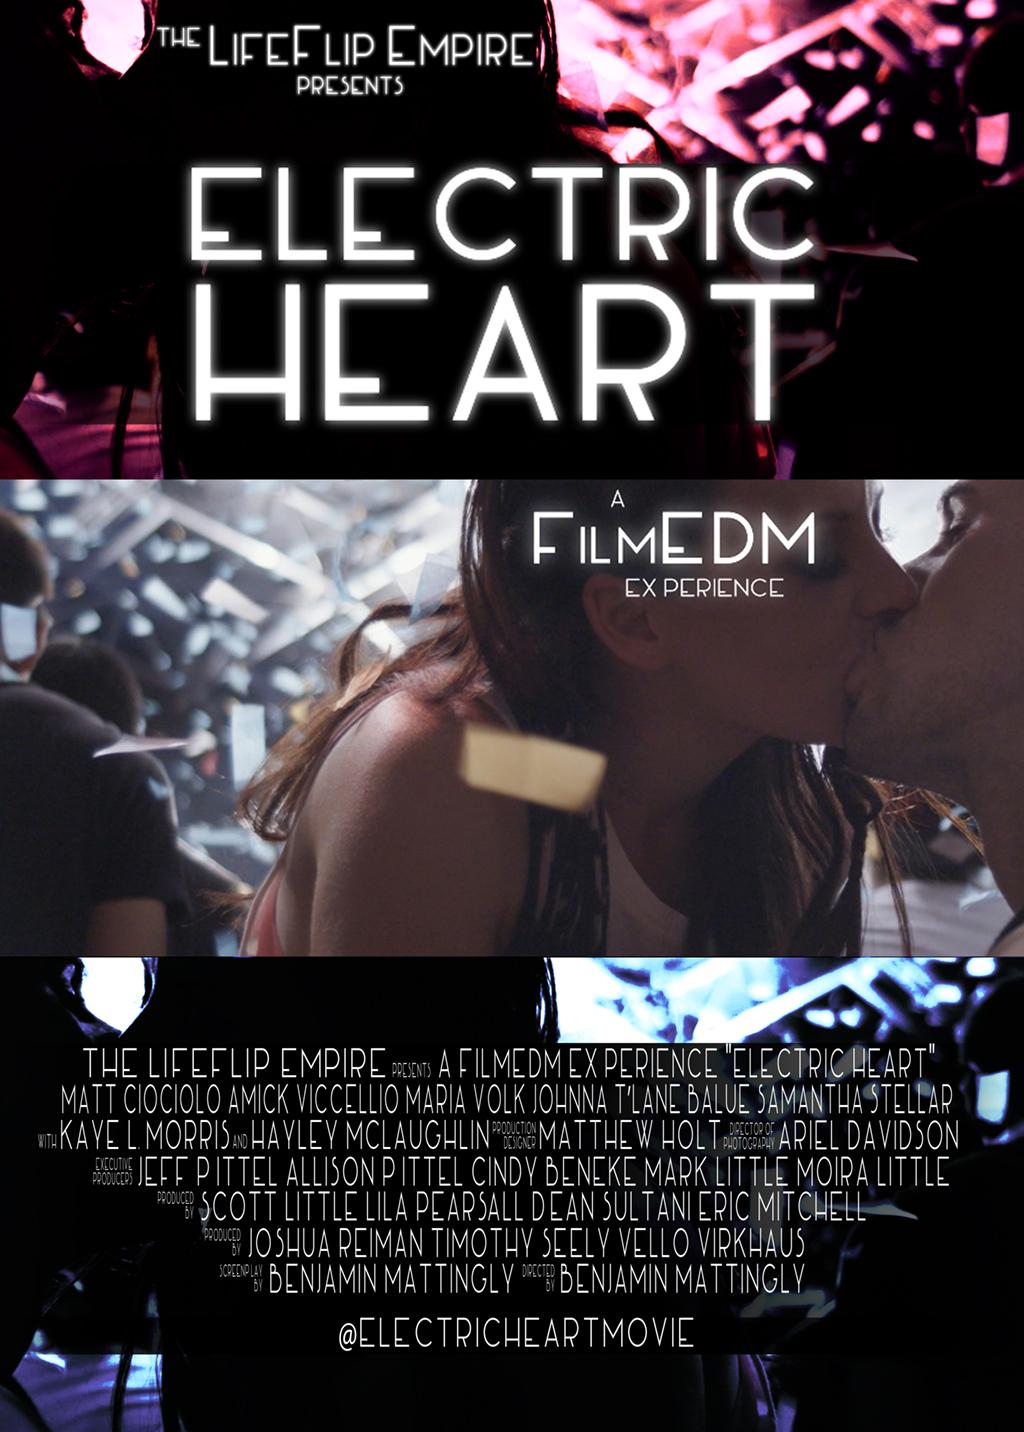 ElectricHeart_Poster_v02nh